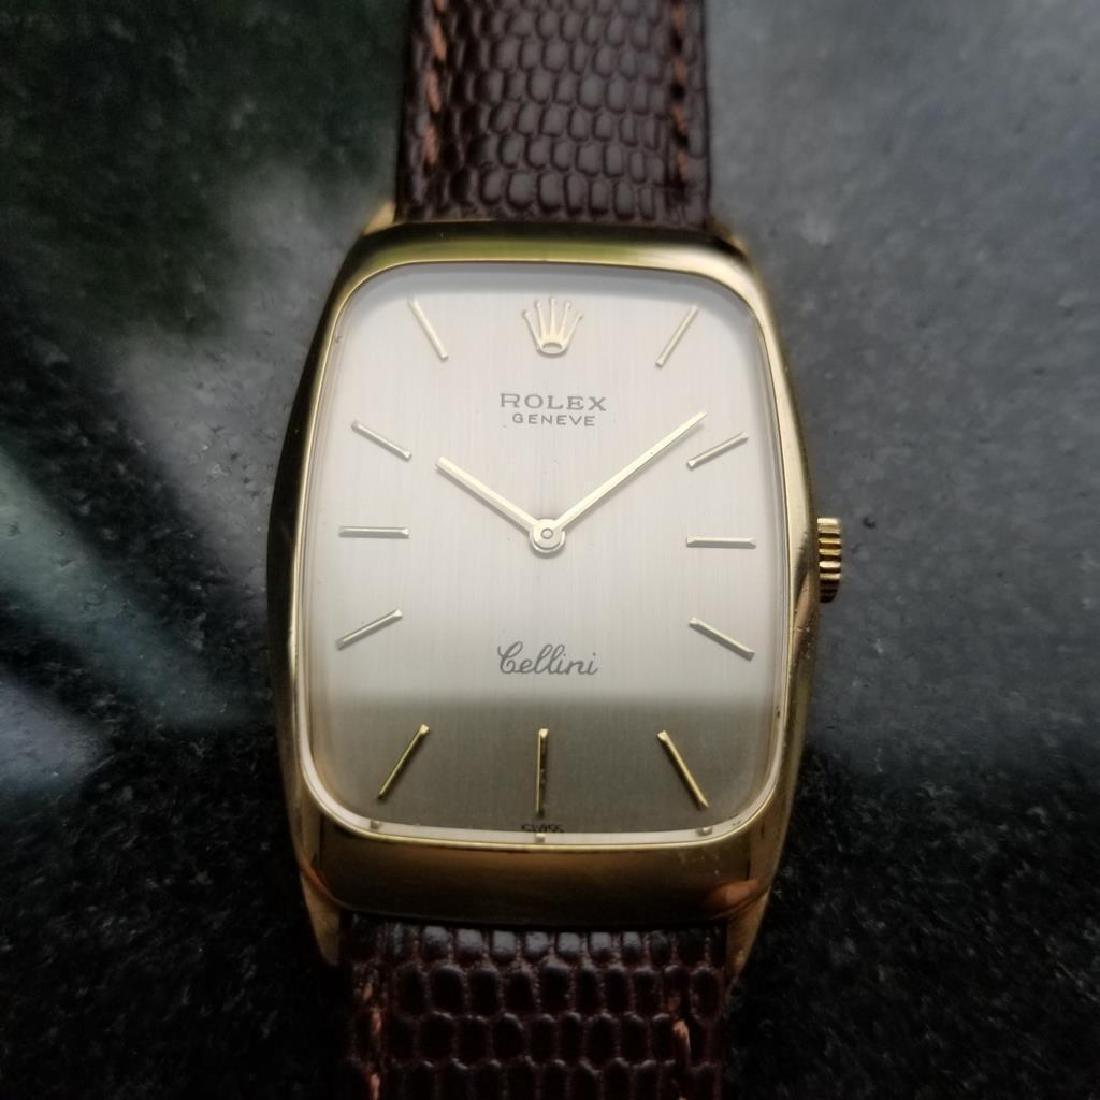 ROLEX Men's 18K Gold Cellini 4136 Hand-Wind Dress Watch - 4